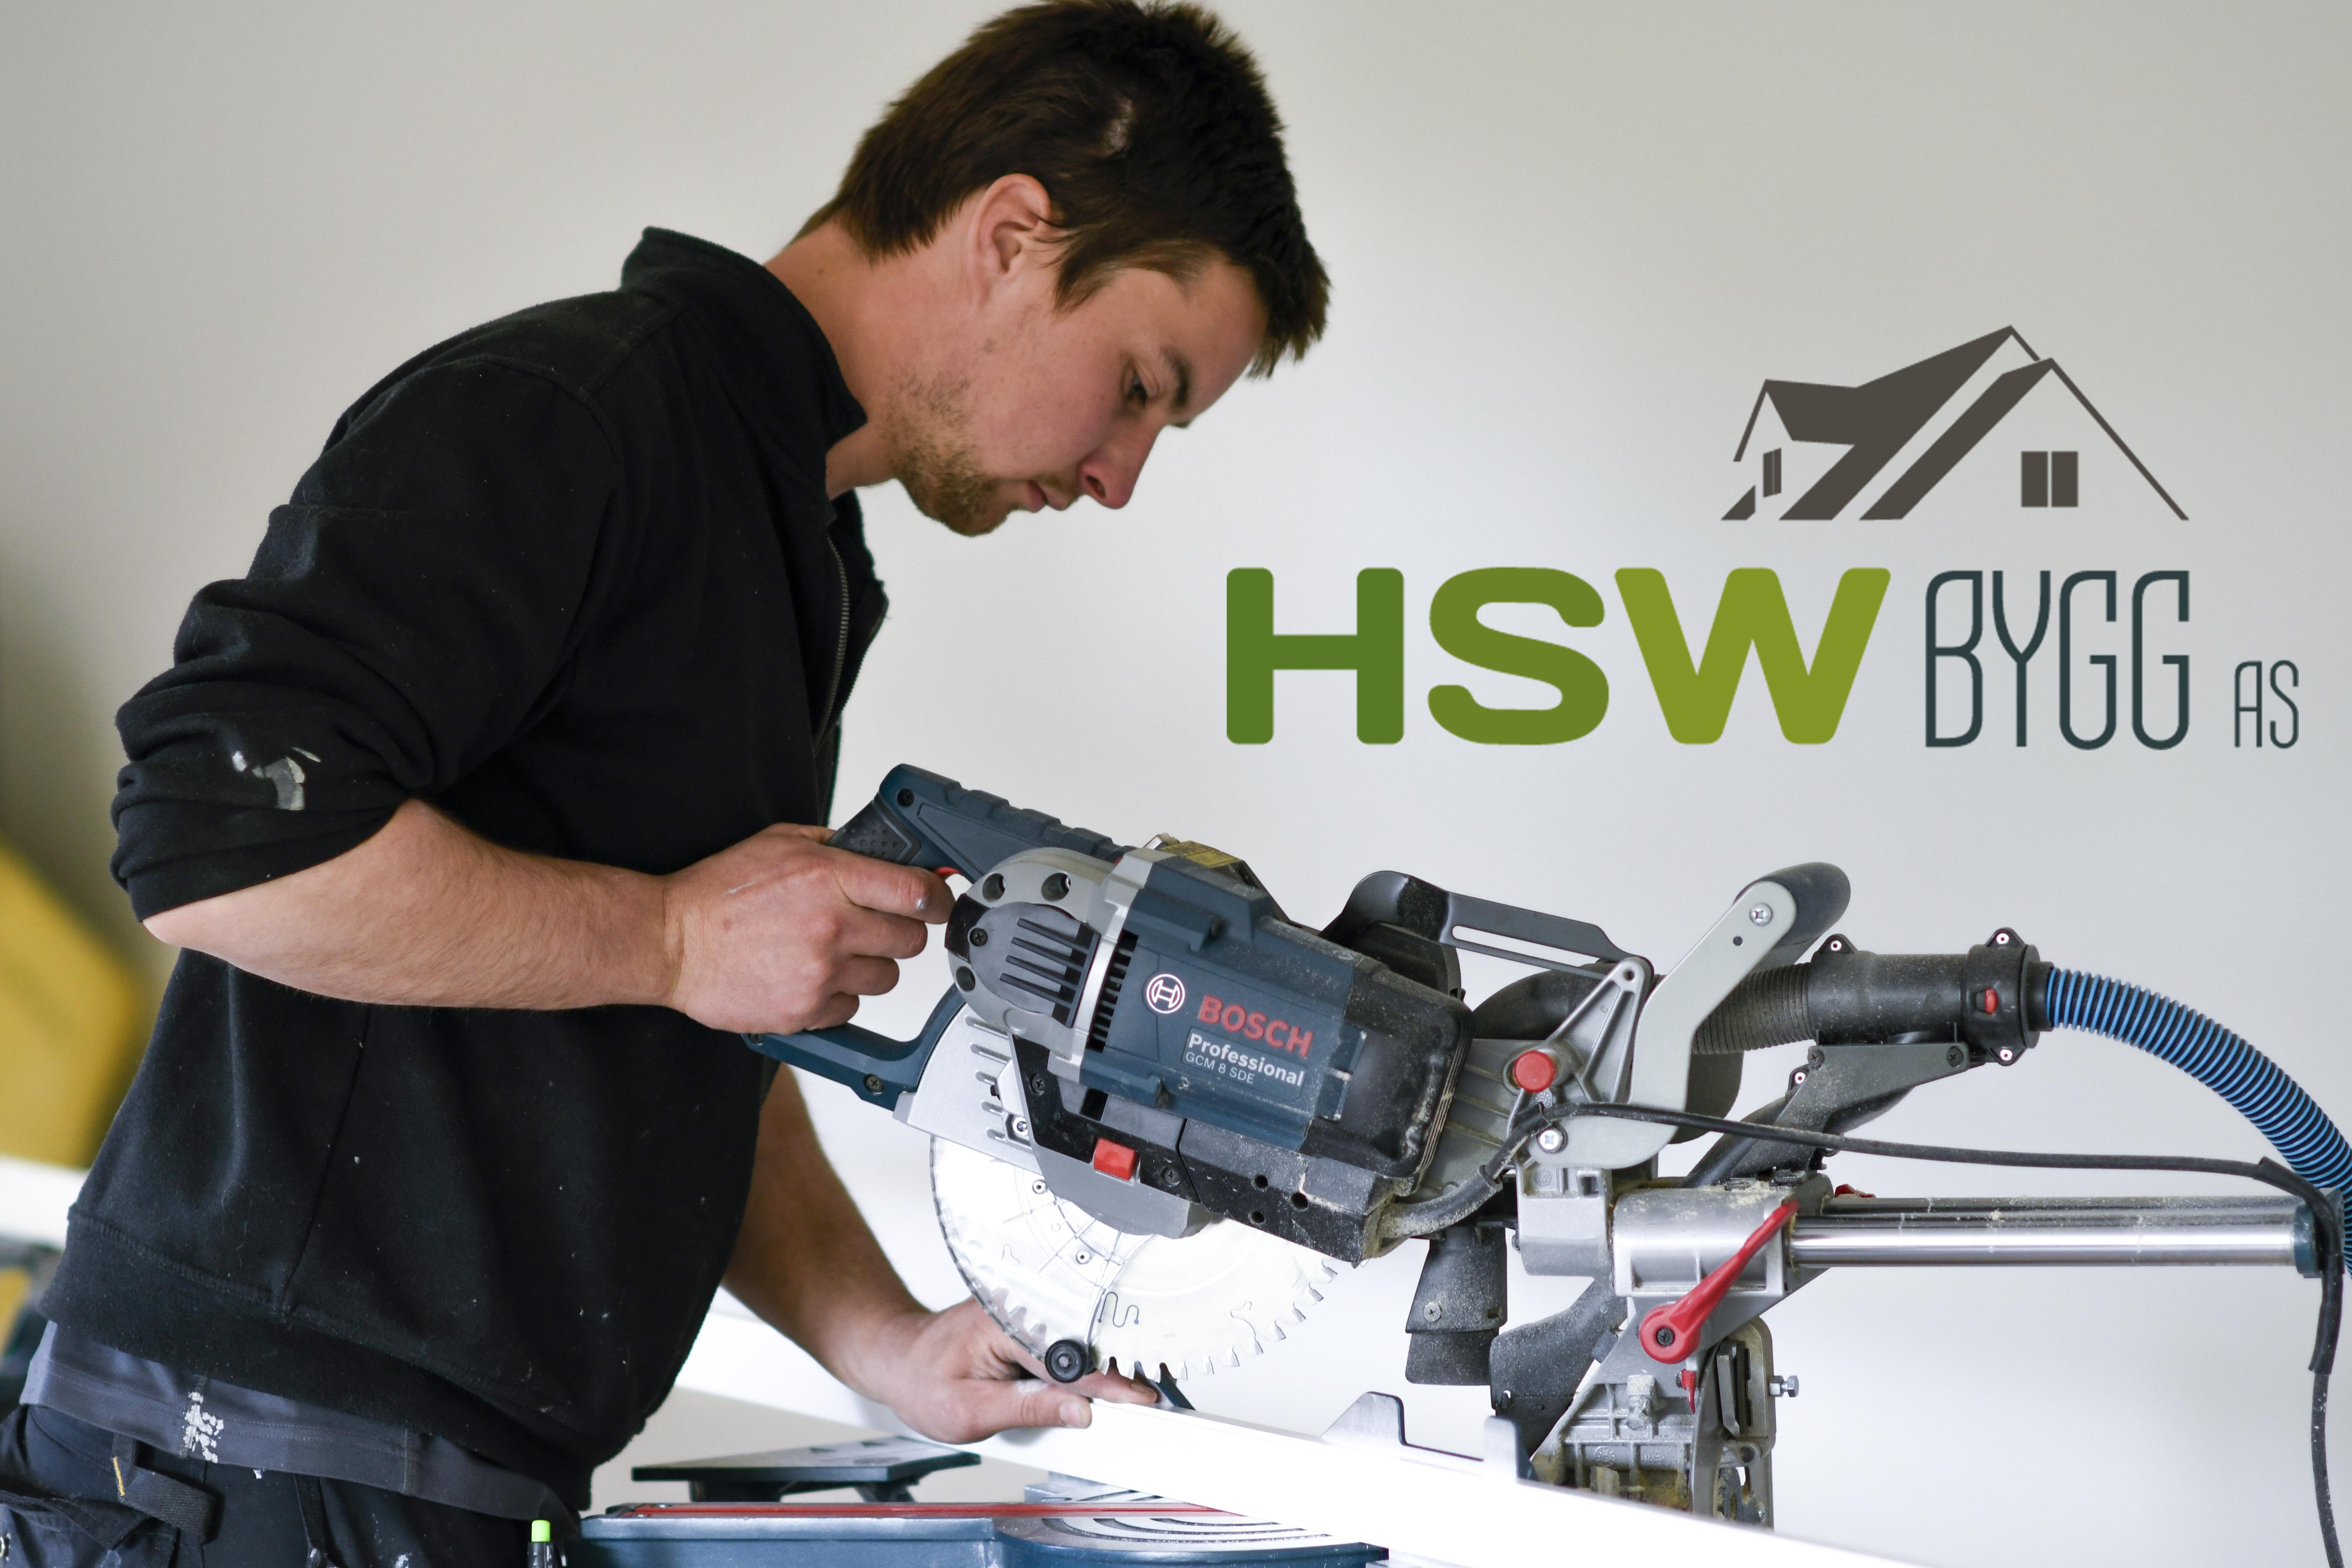 HSW Bygg AS - Fagbrev i tømrerfaget - ledig stilling